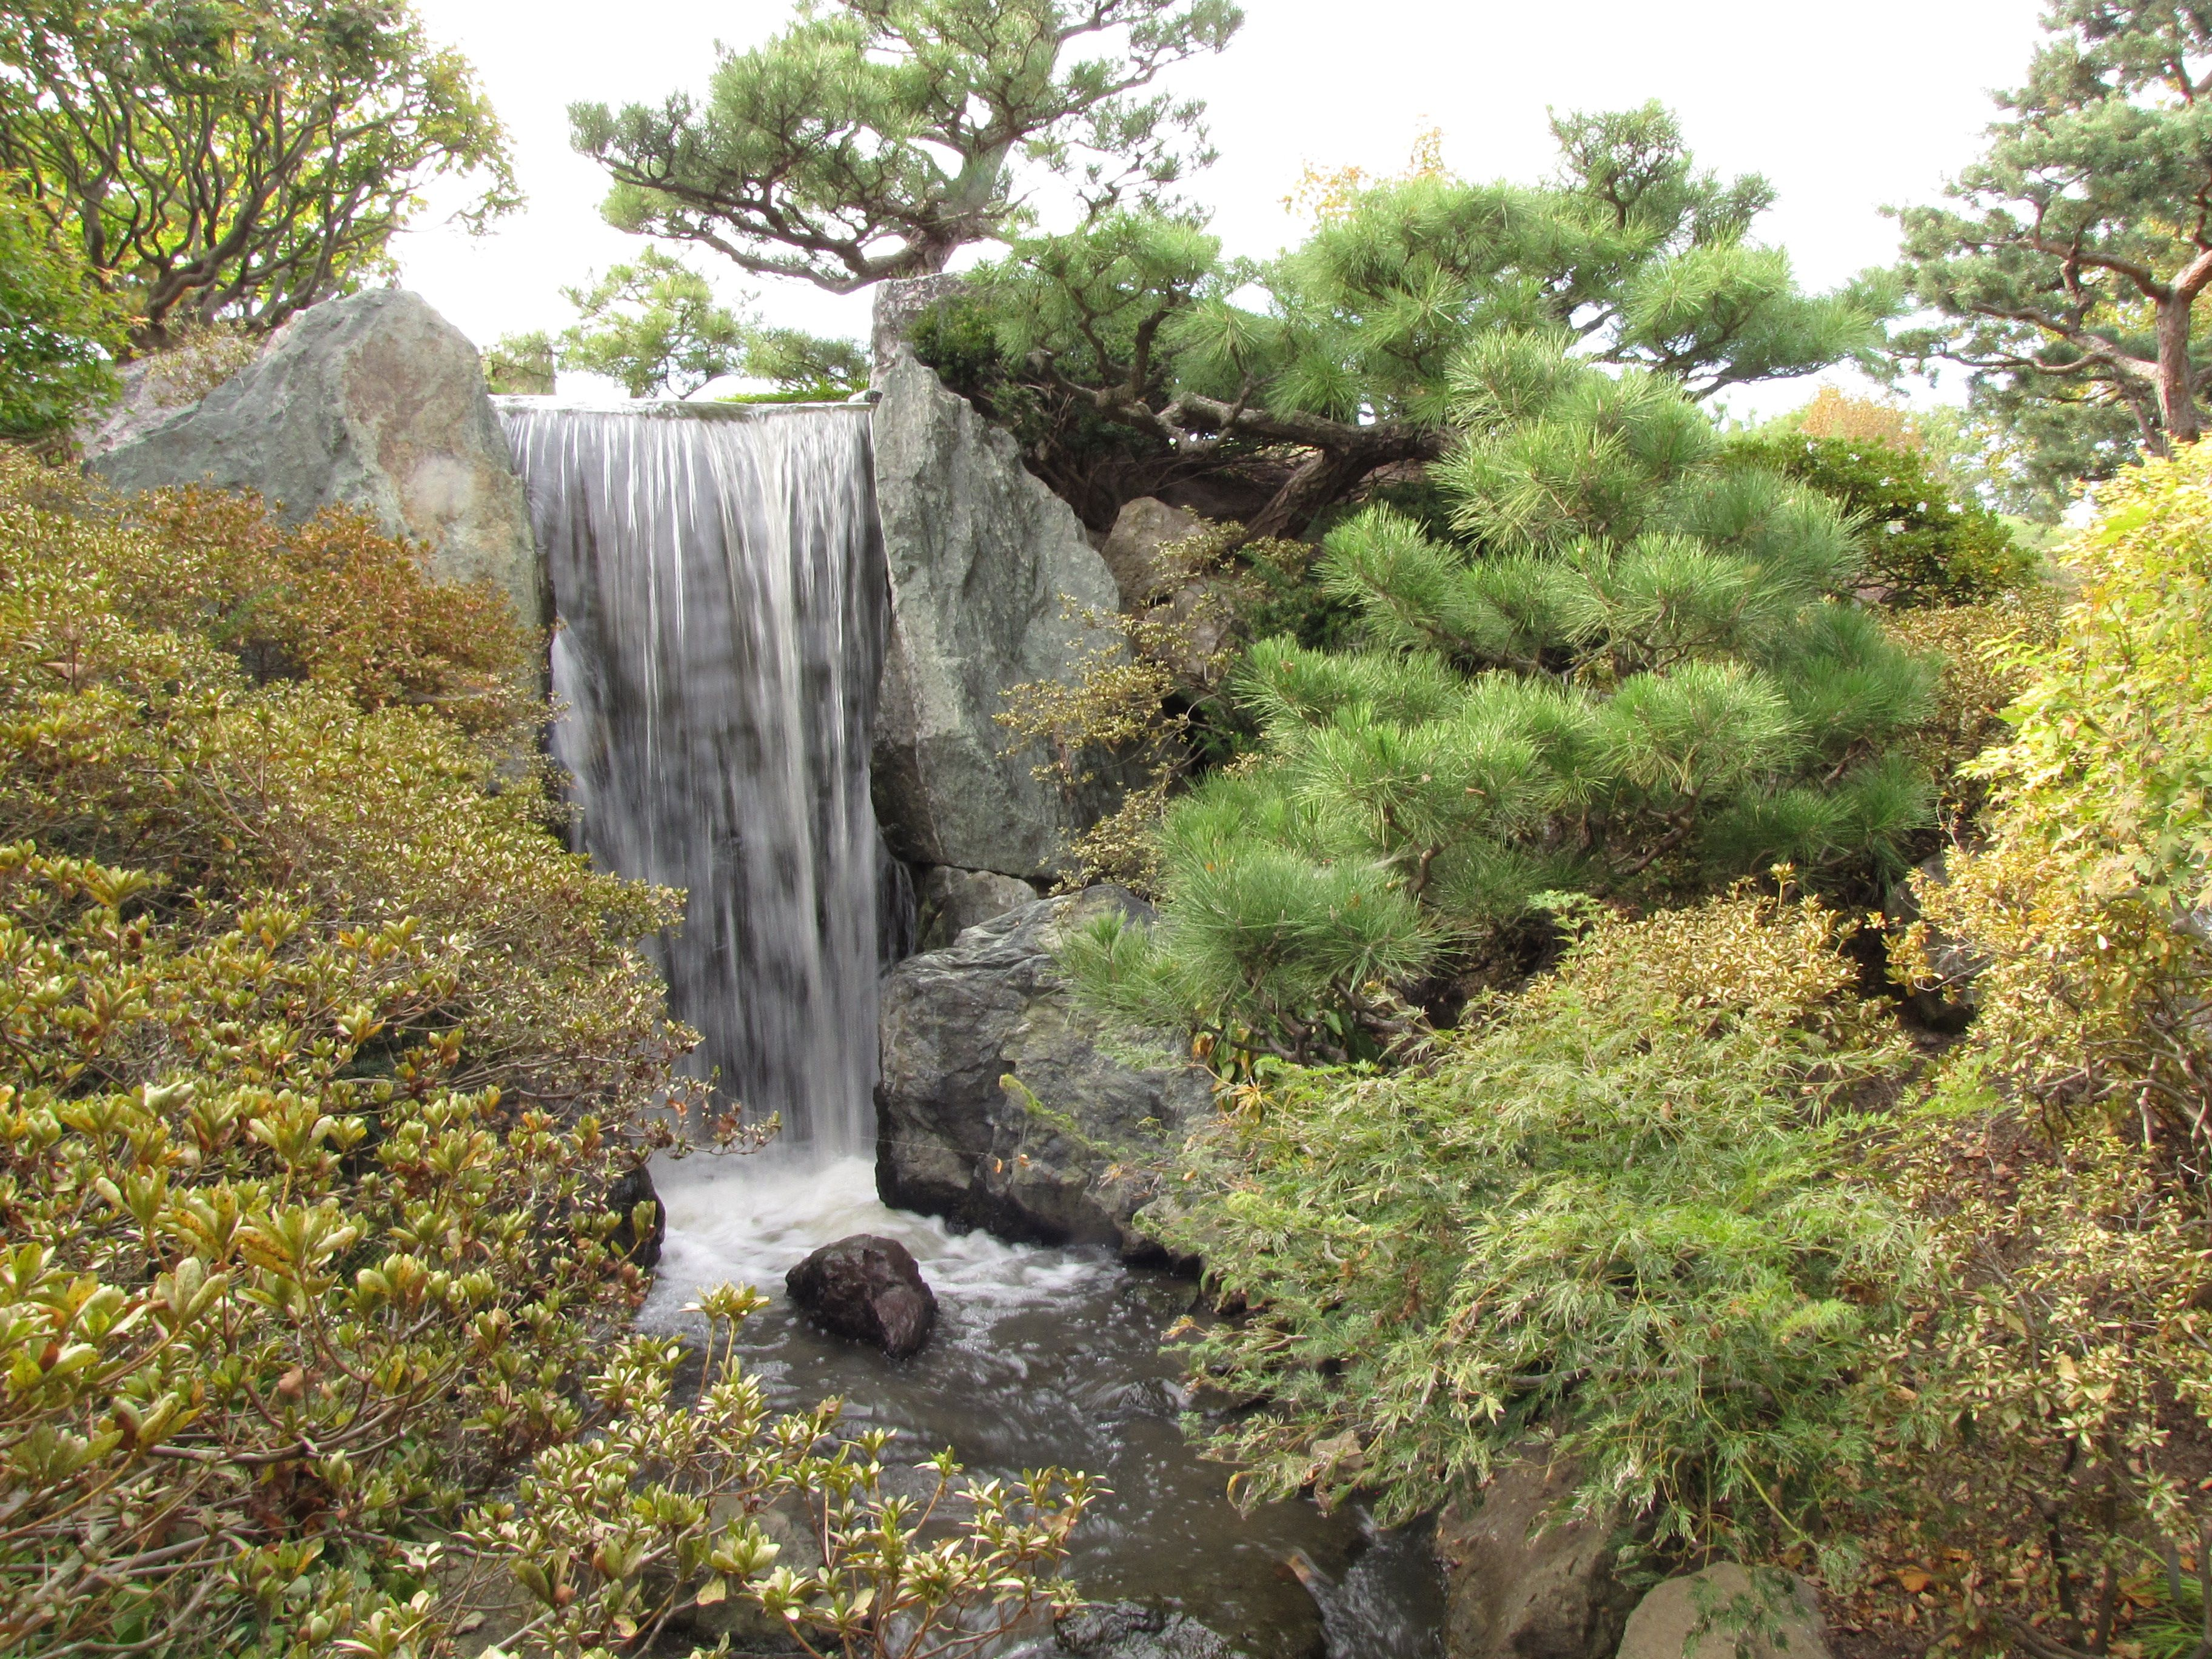 Japanese Gardens Waterfalls | WATERFALL IN THE JAPANESE GARDEN